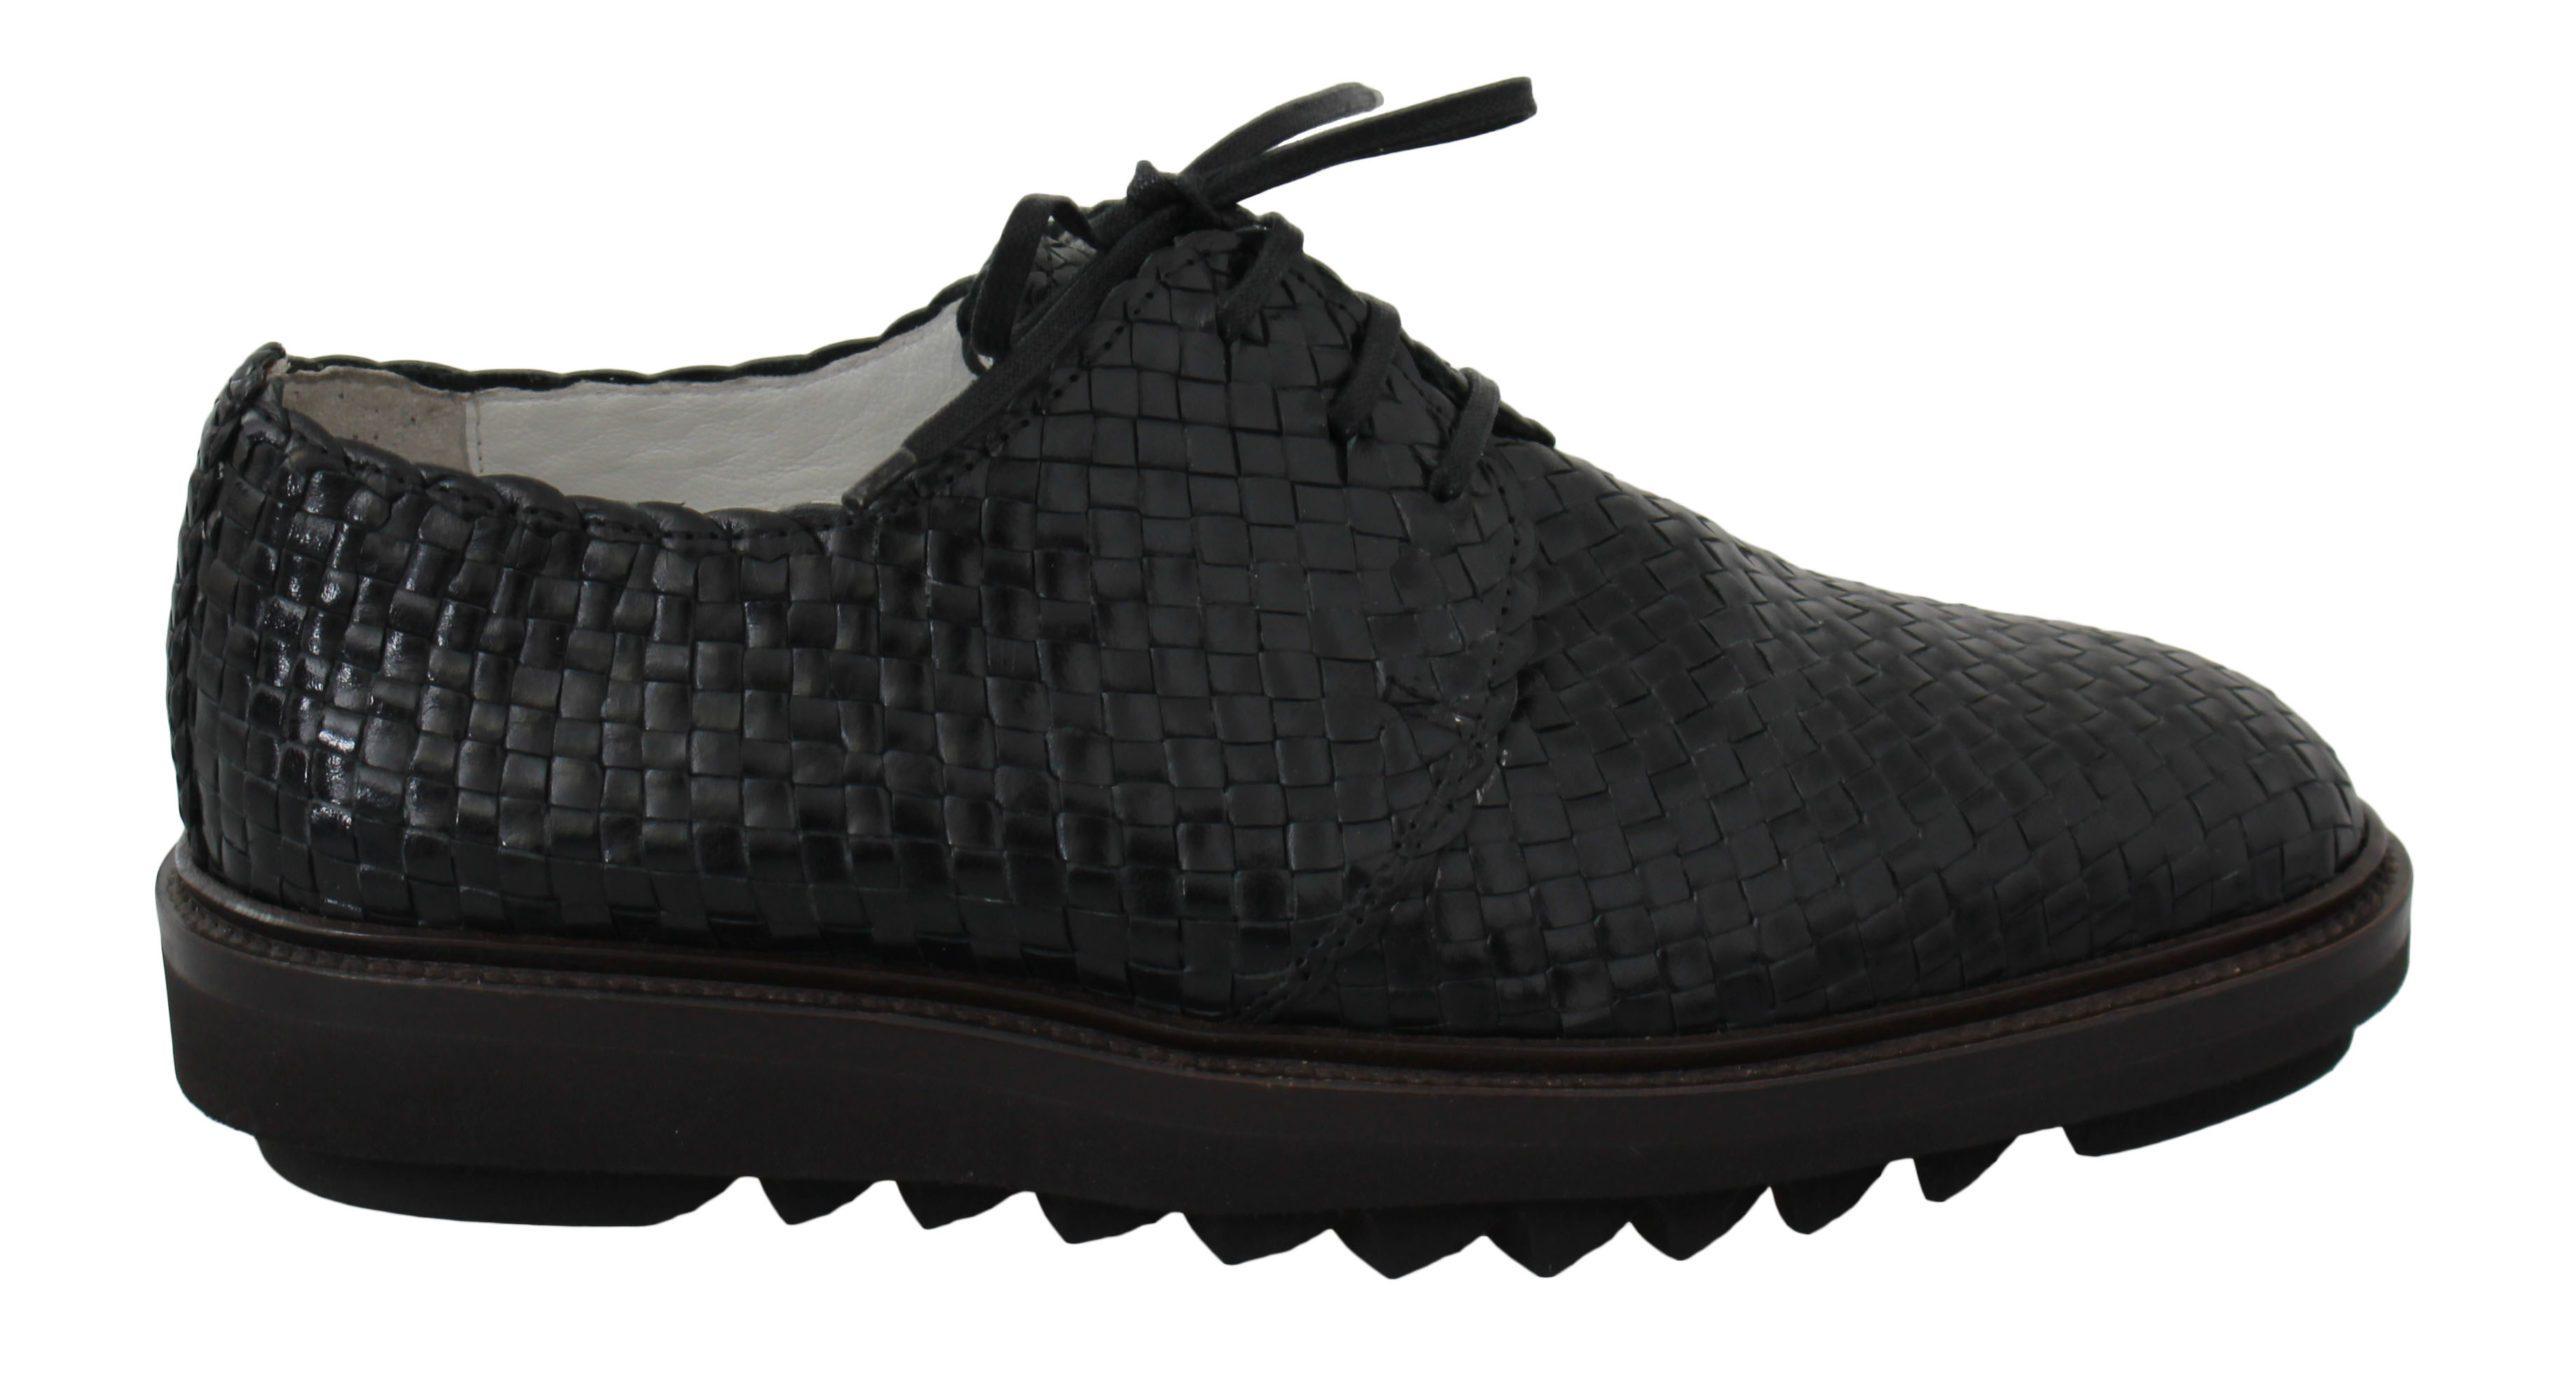 Dolce & Gabbana Men's Woven Knit Leather Derby Shoes Black MV2506 - EU39/US6